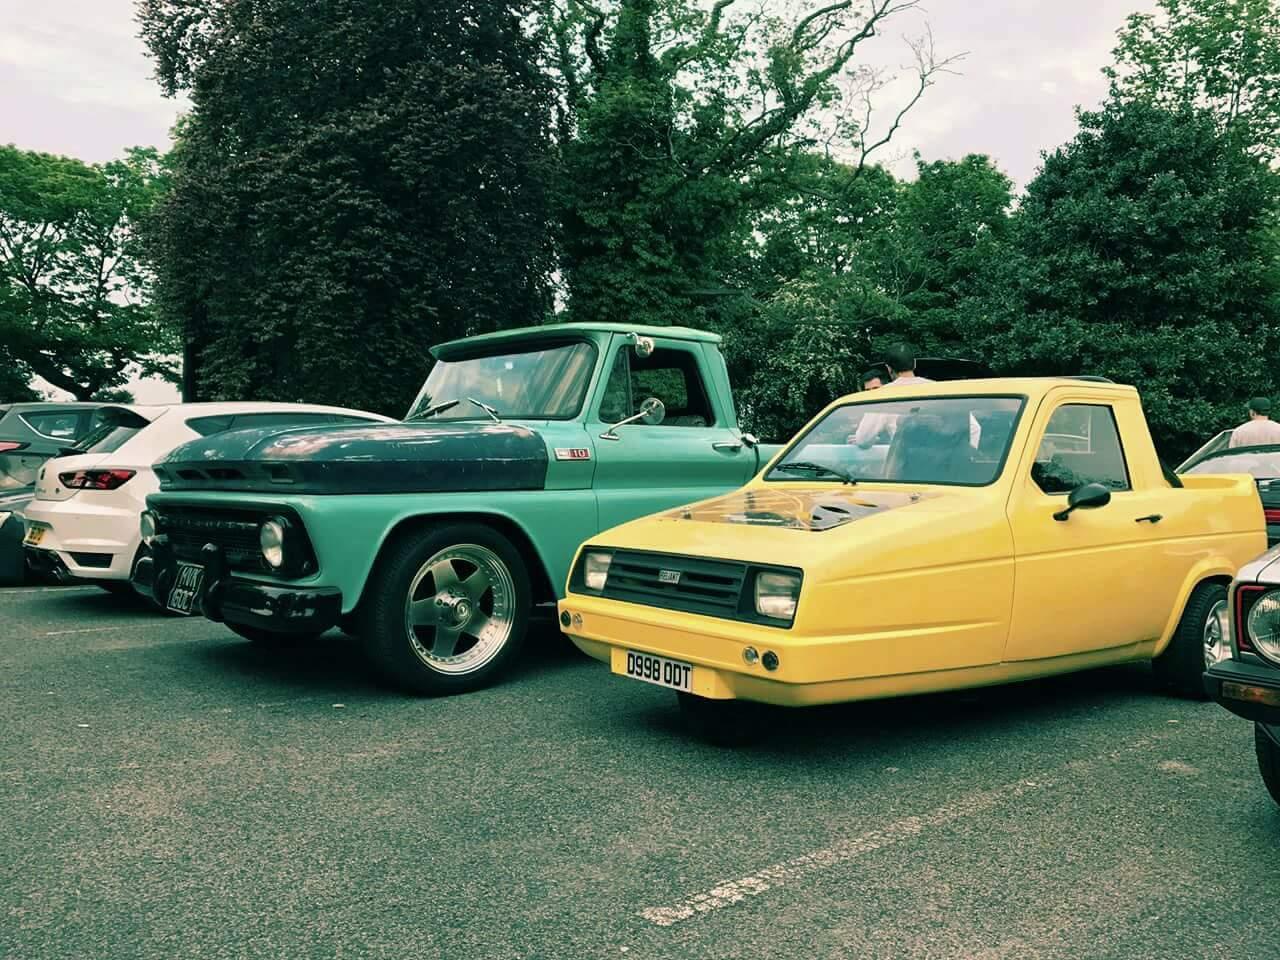 Classic Car Meet Lock Keeper Worksop